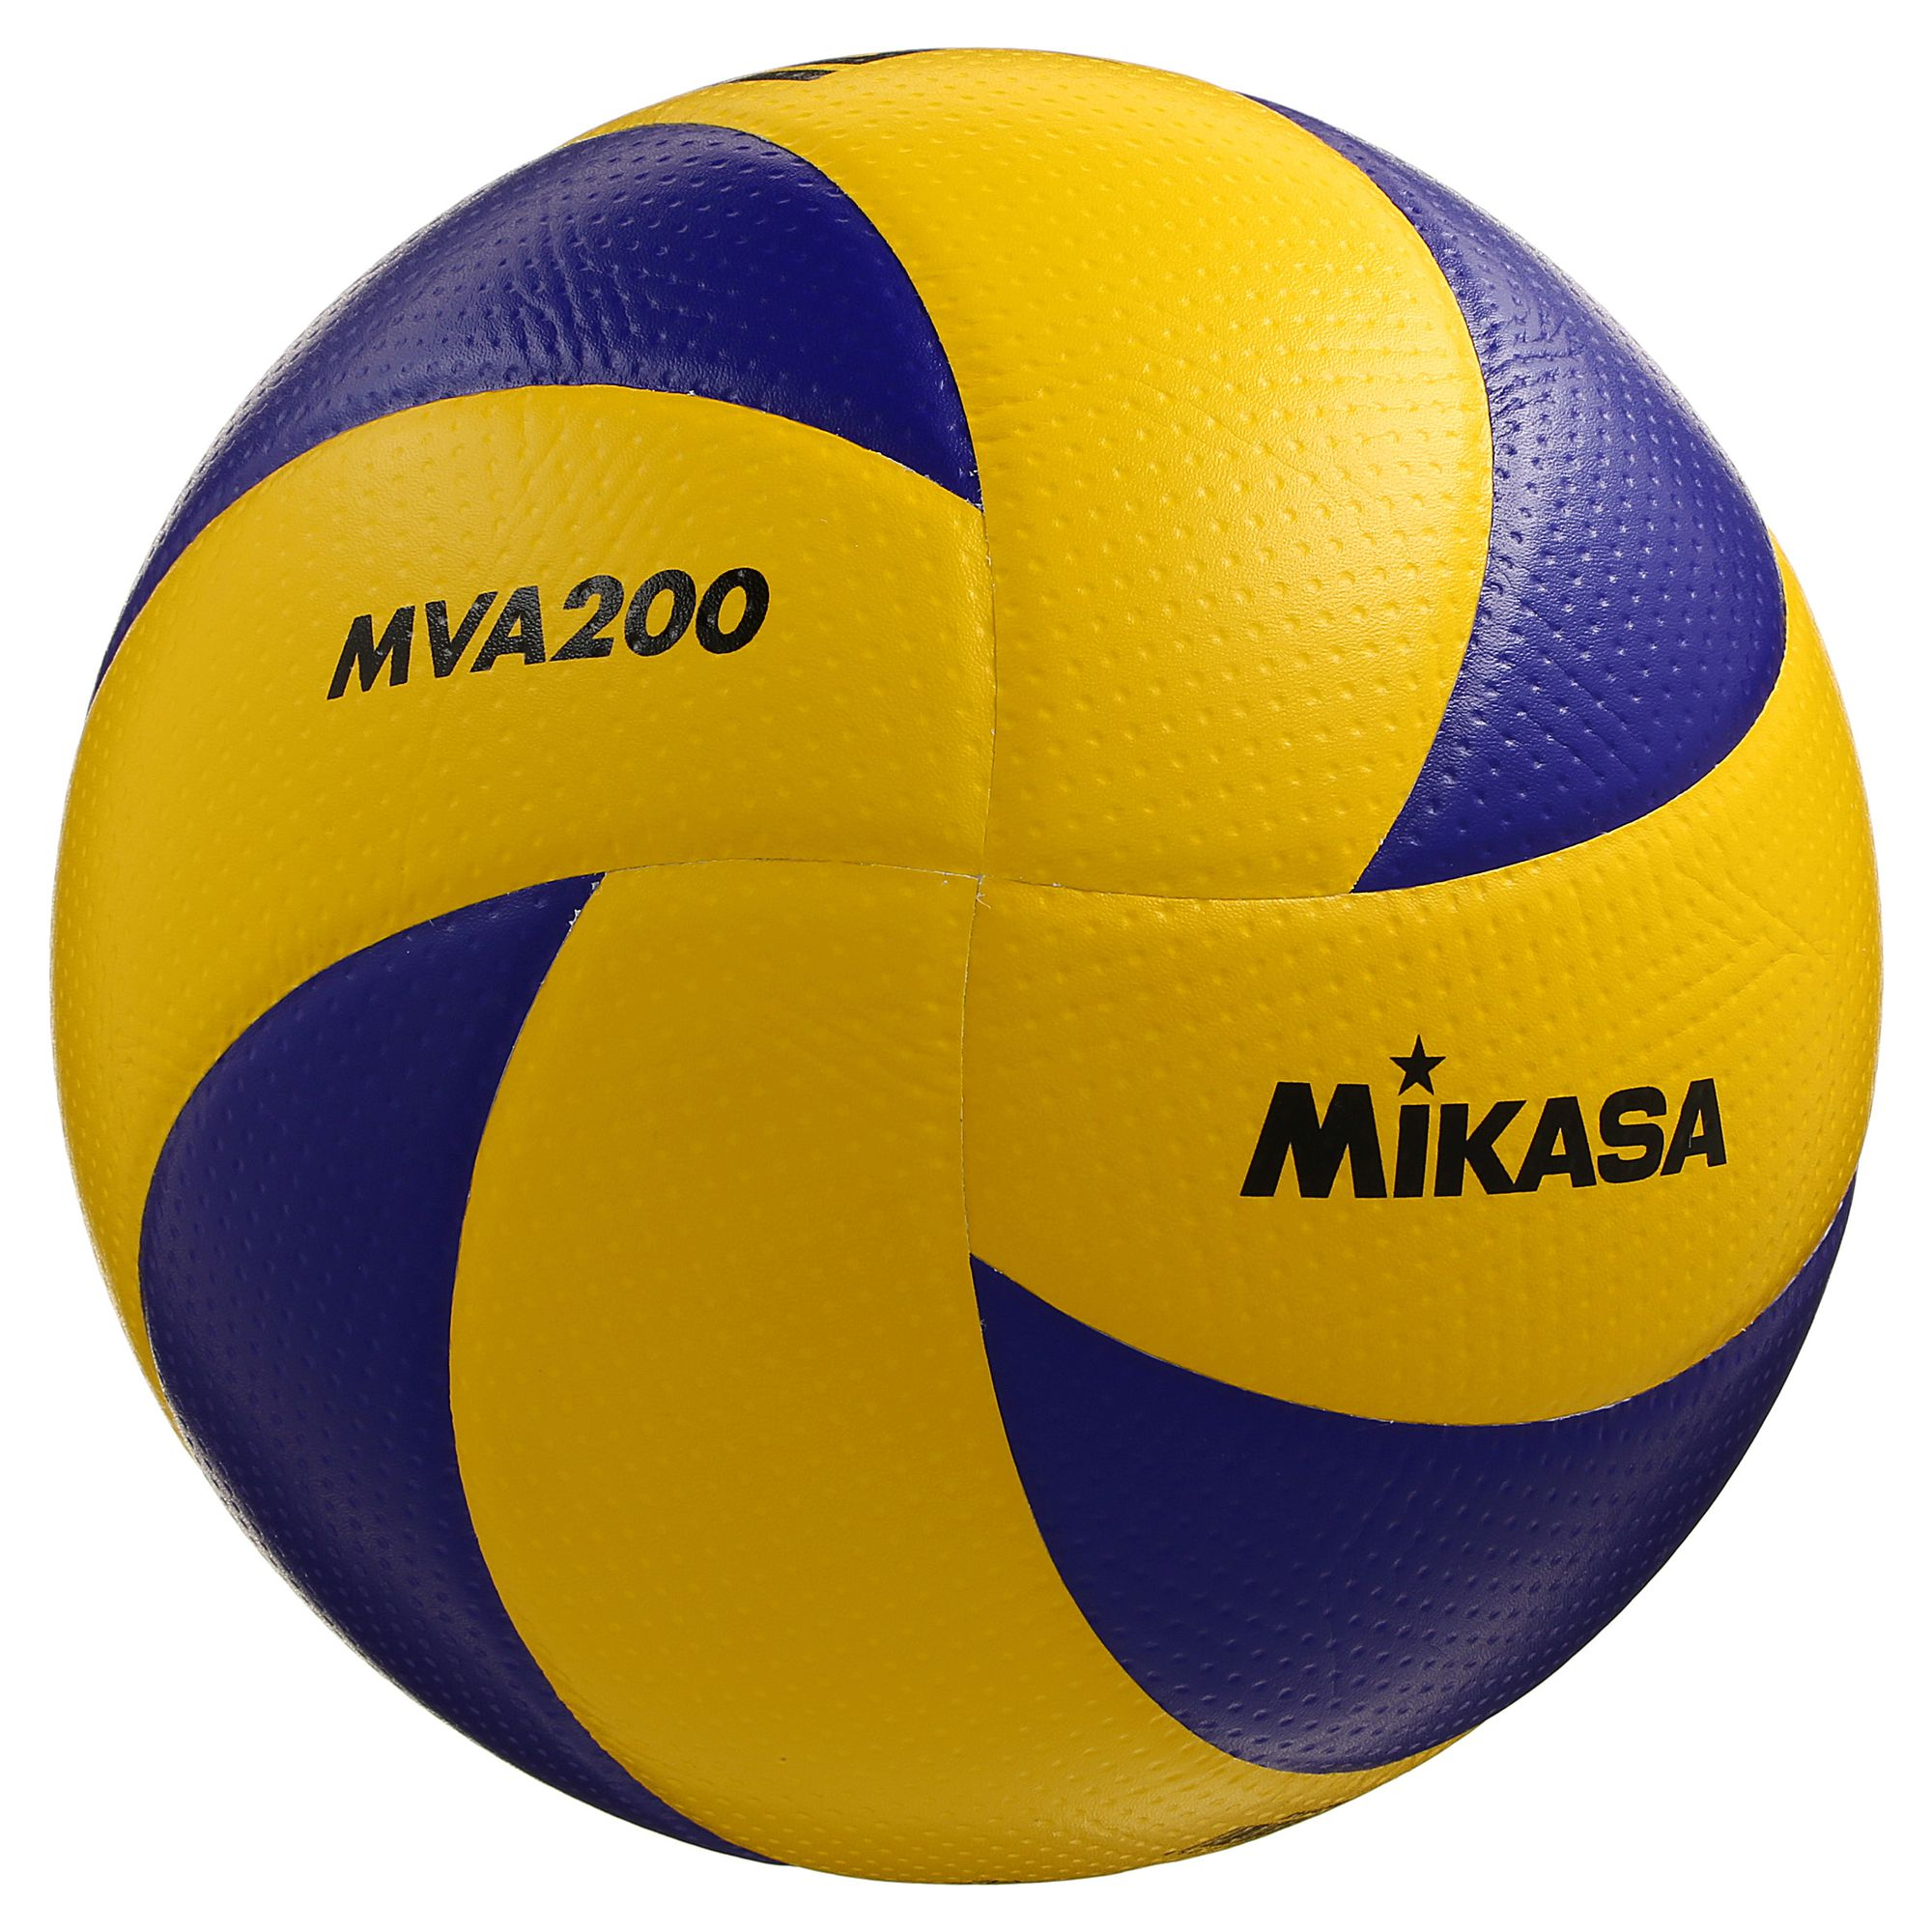 BALLON VOLLEY-BALL MVA 200 COMPETITION MIKASA